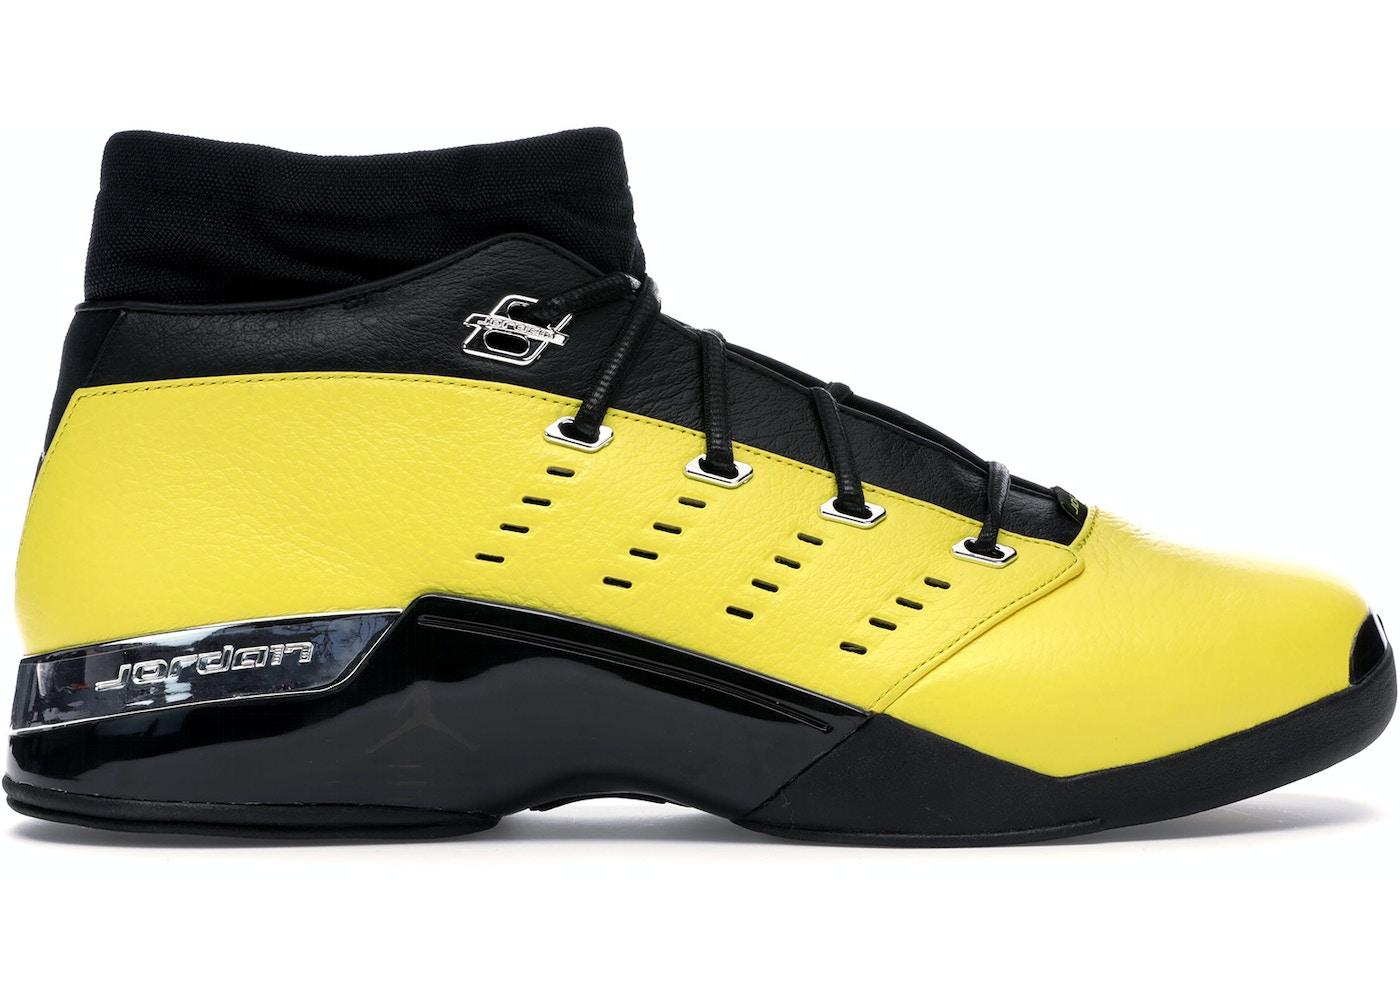 d57a8be03efa Buy Air Jordan 17 Shoes   Deadstock Sneakers